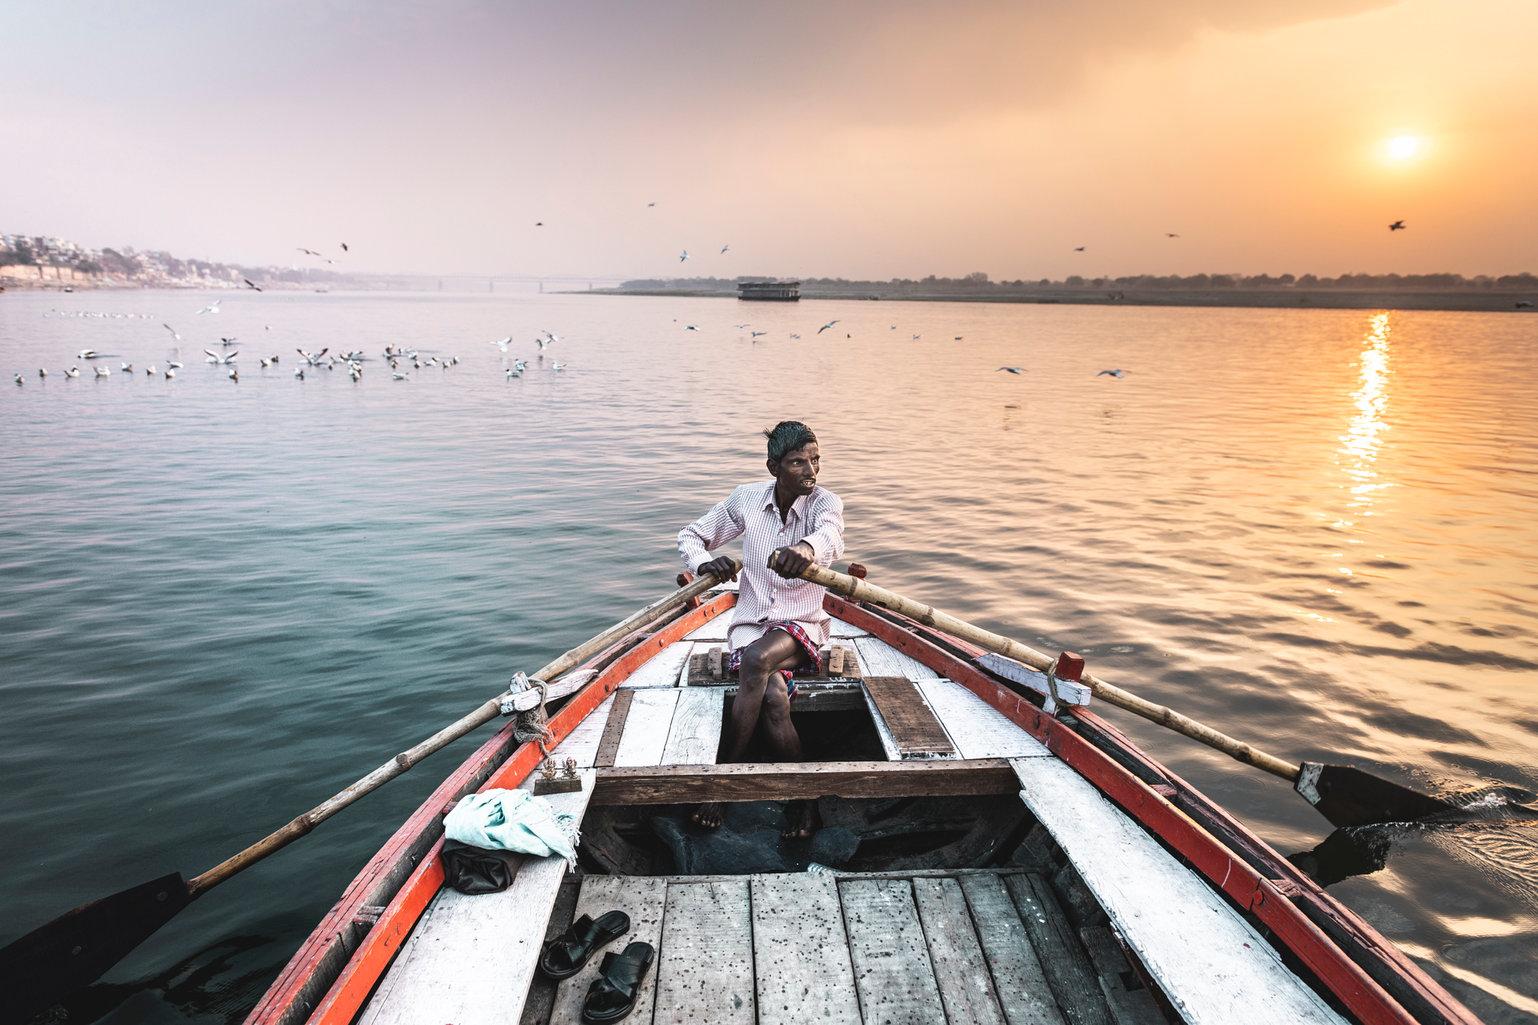 En aguas del Ganges, Varanasi. India